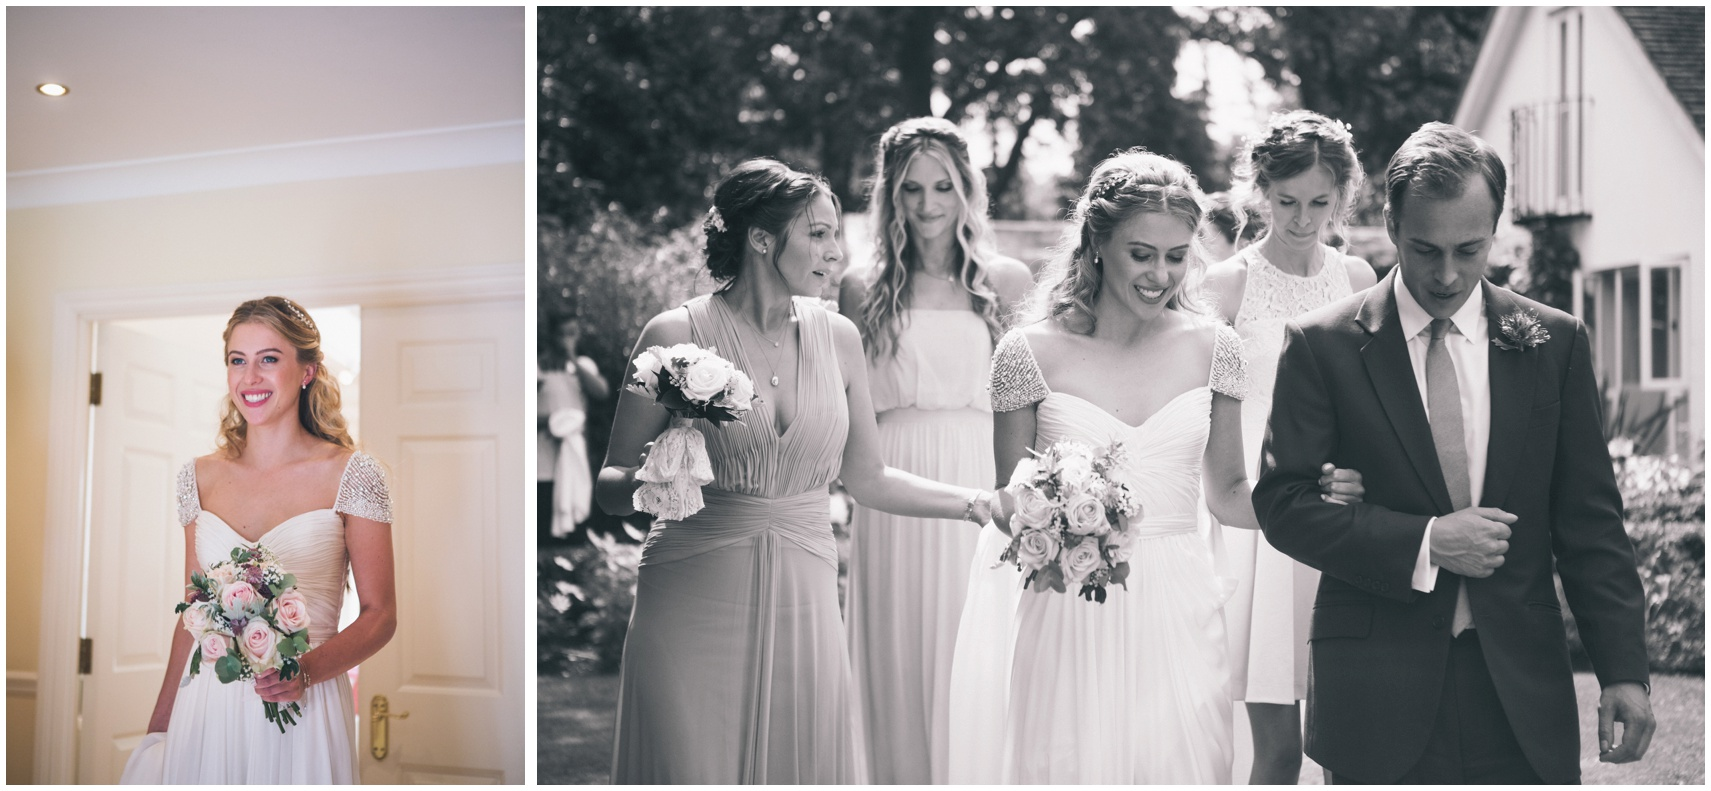 BMC Wedding photography Rutland_0278.jpg